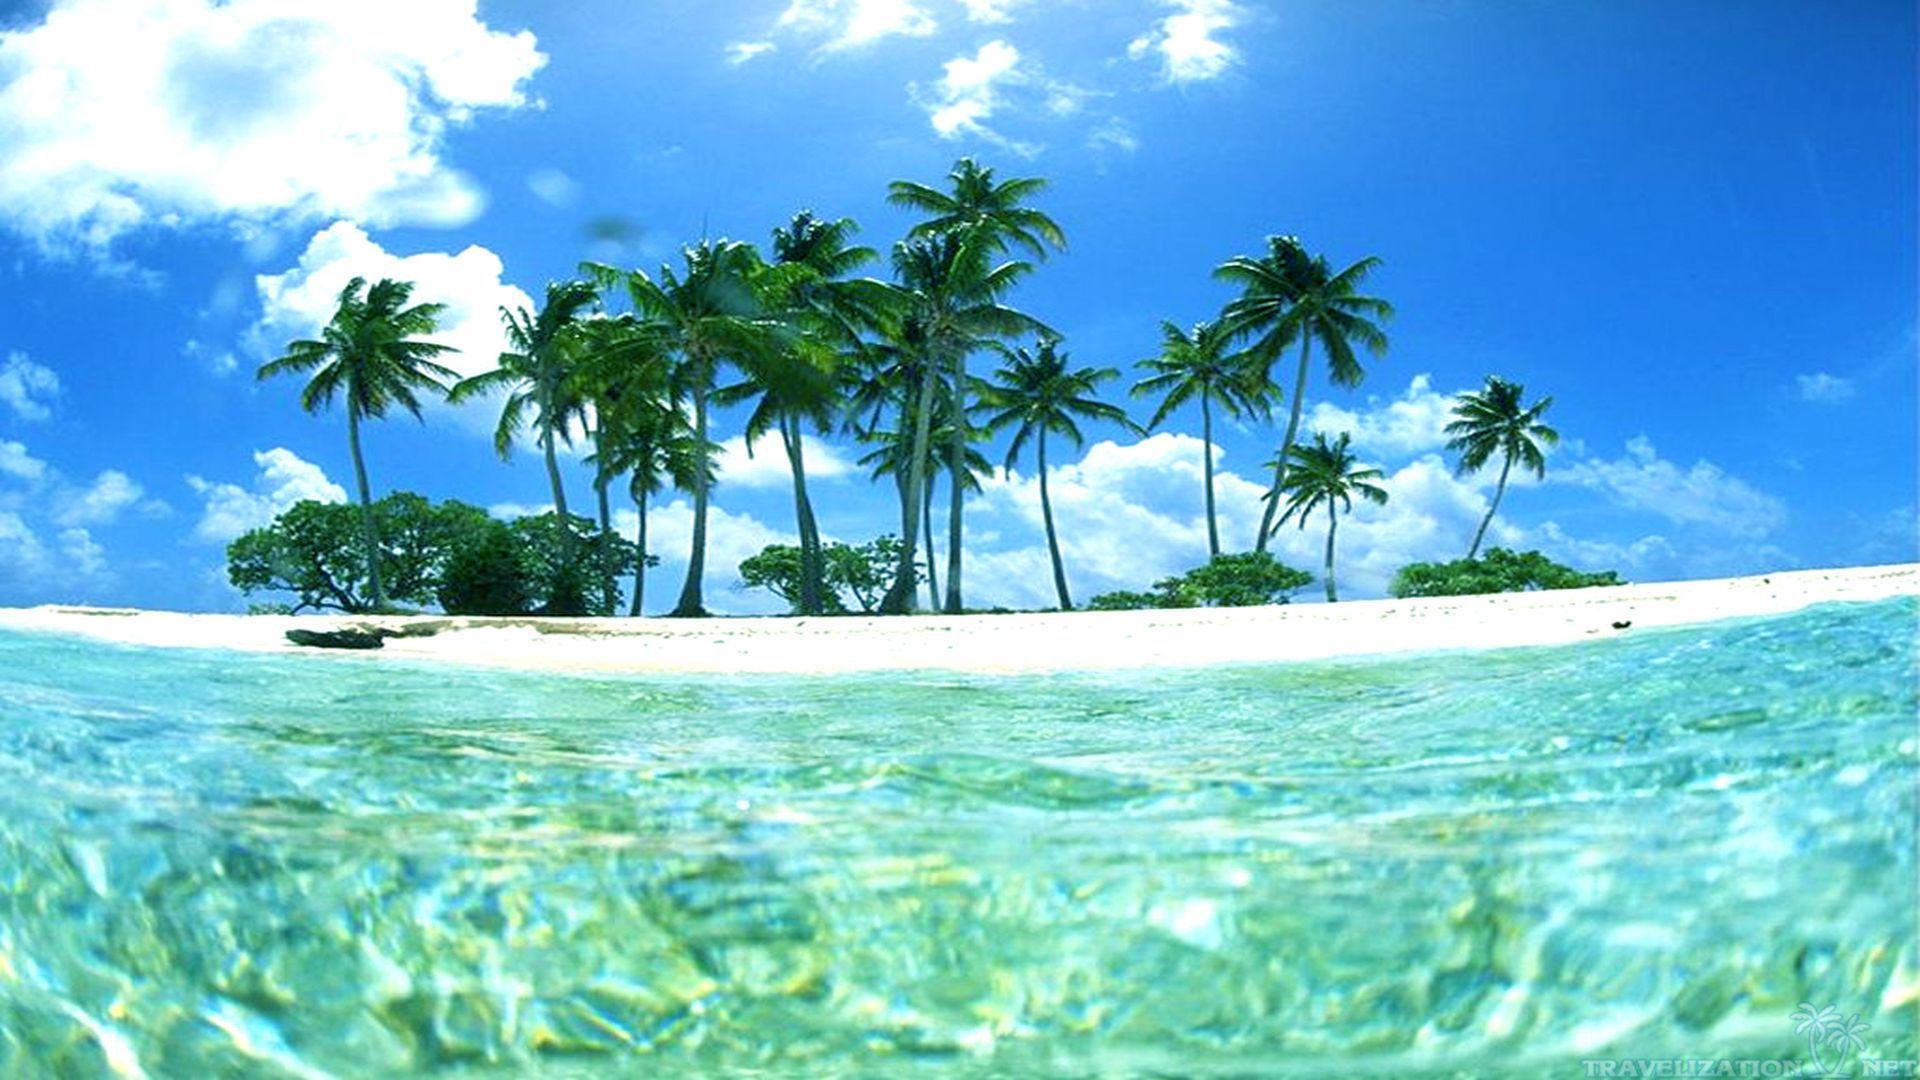 Beautiful Tropical Islands Desktop Wallpaper 1920x1080